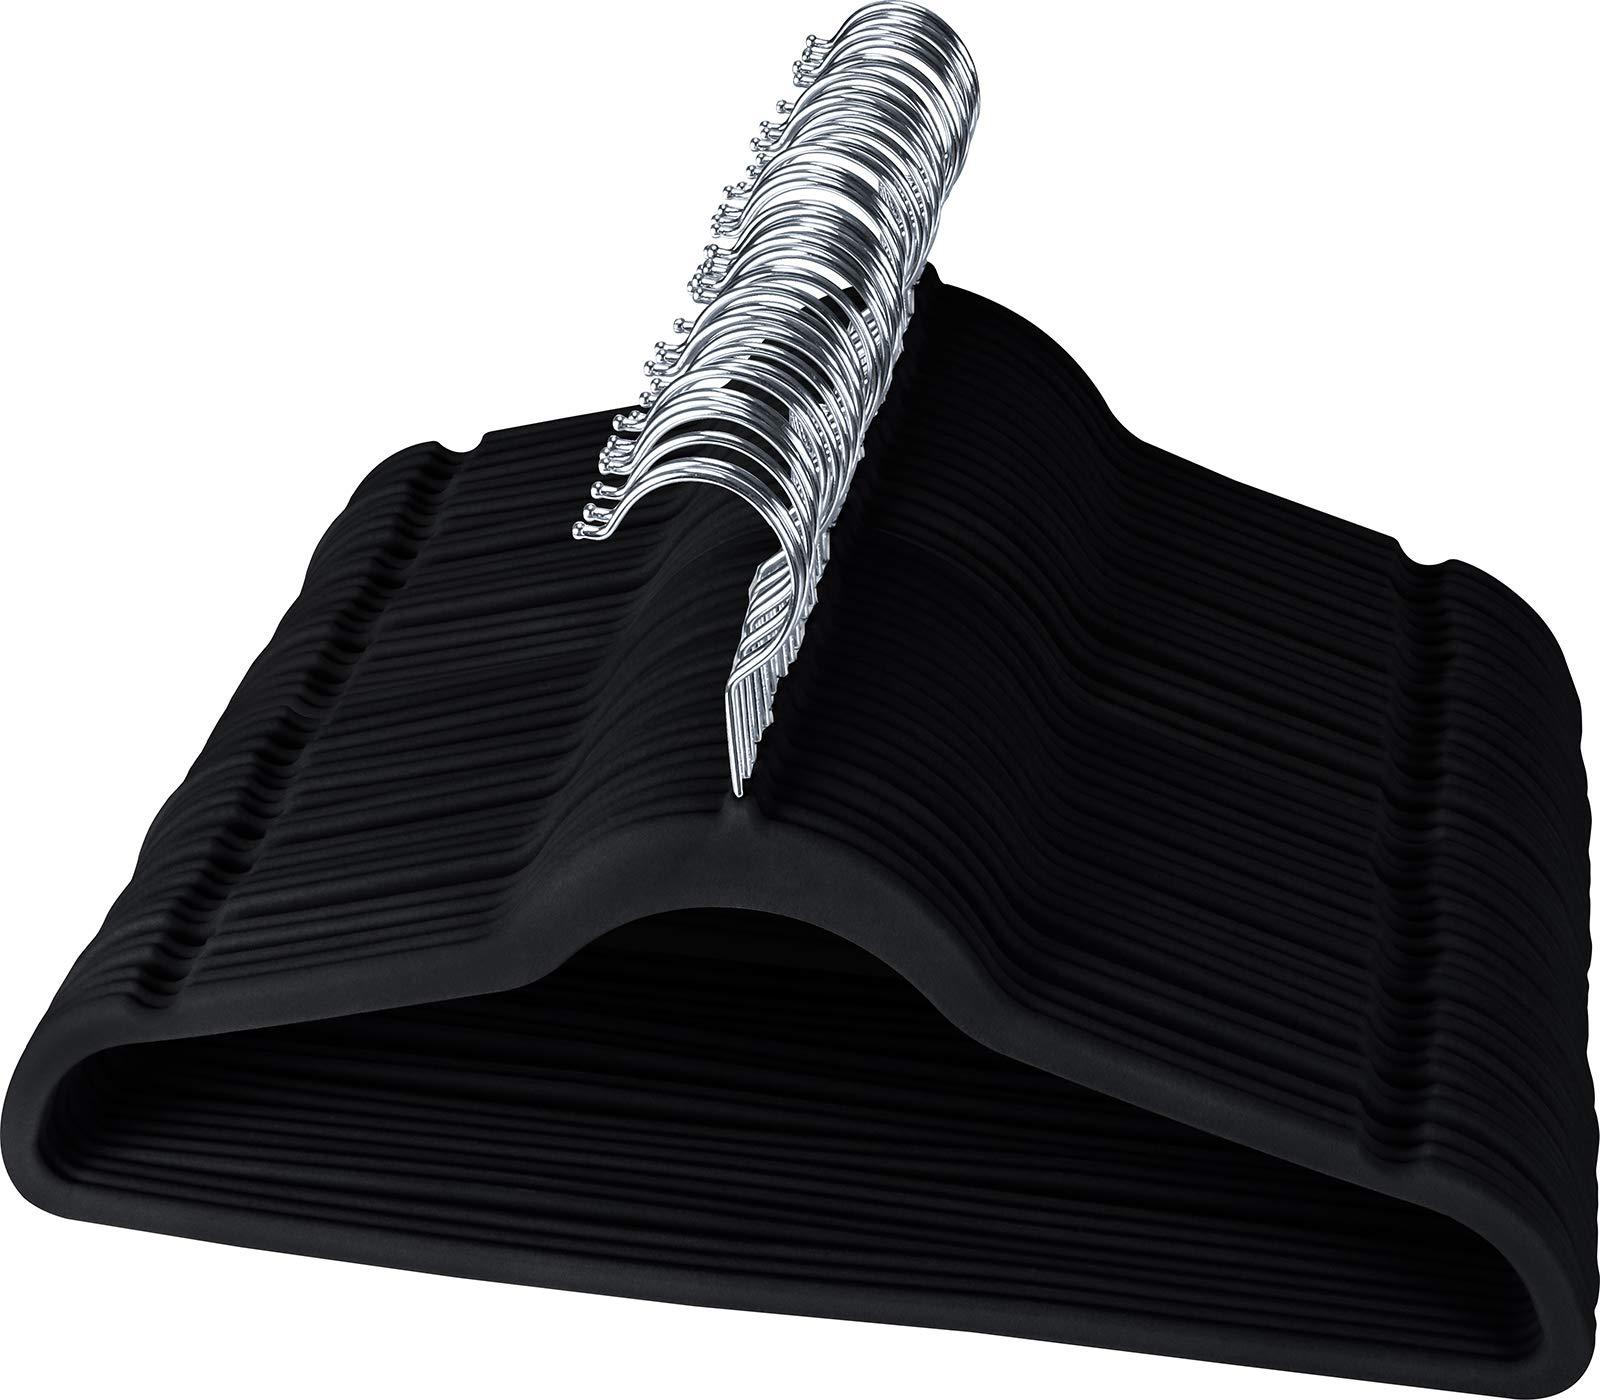 Utopia Home Premium Non-Slip Velvet Hangers (Pack of 50) - Heavy Duty - Coat Hangers - Pant Hangers - Black by Utopia Home